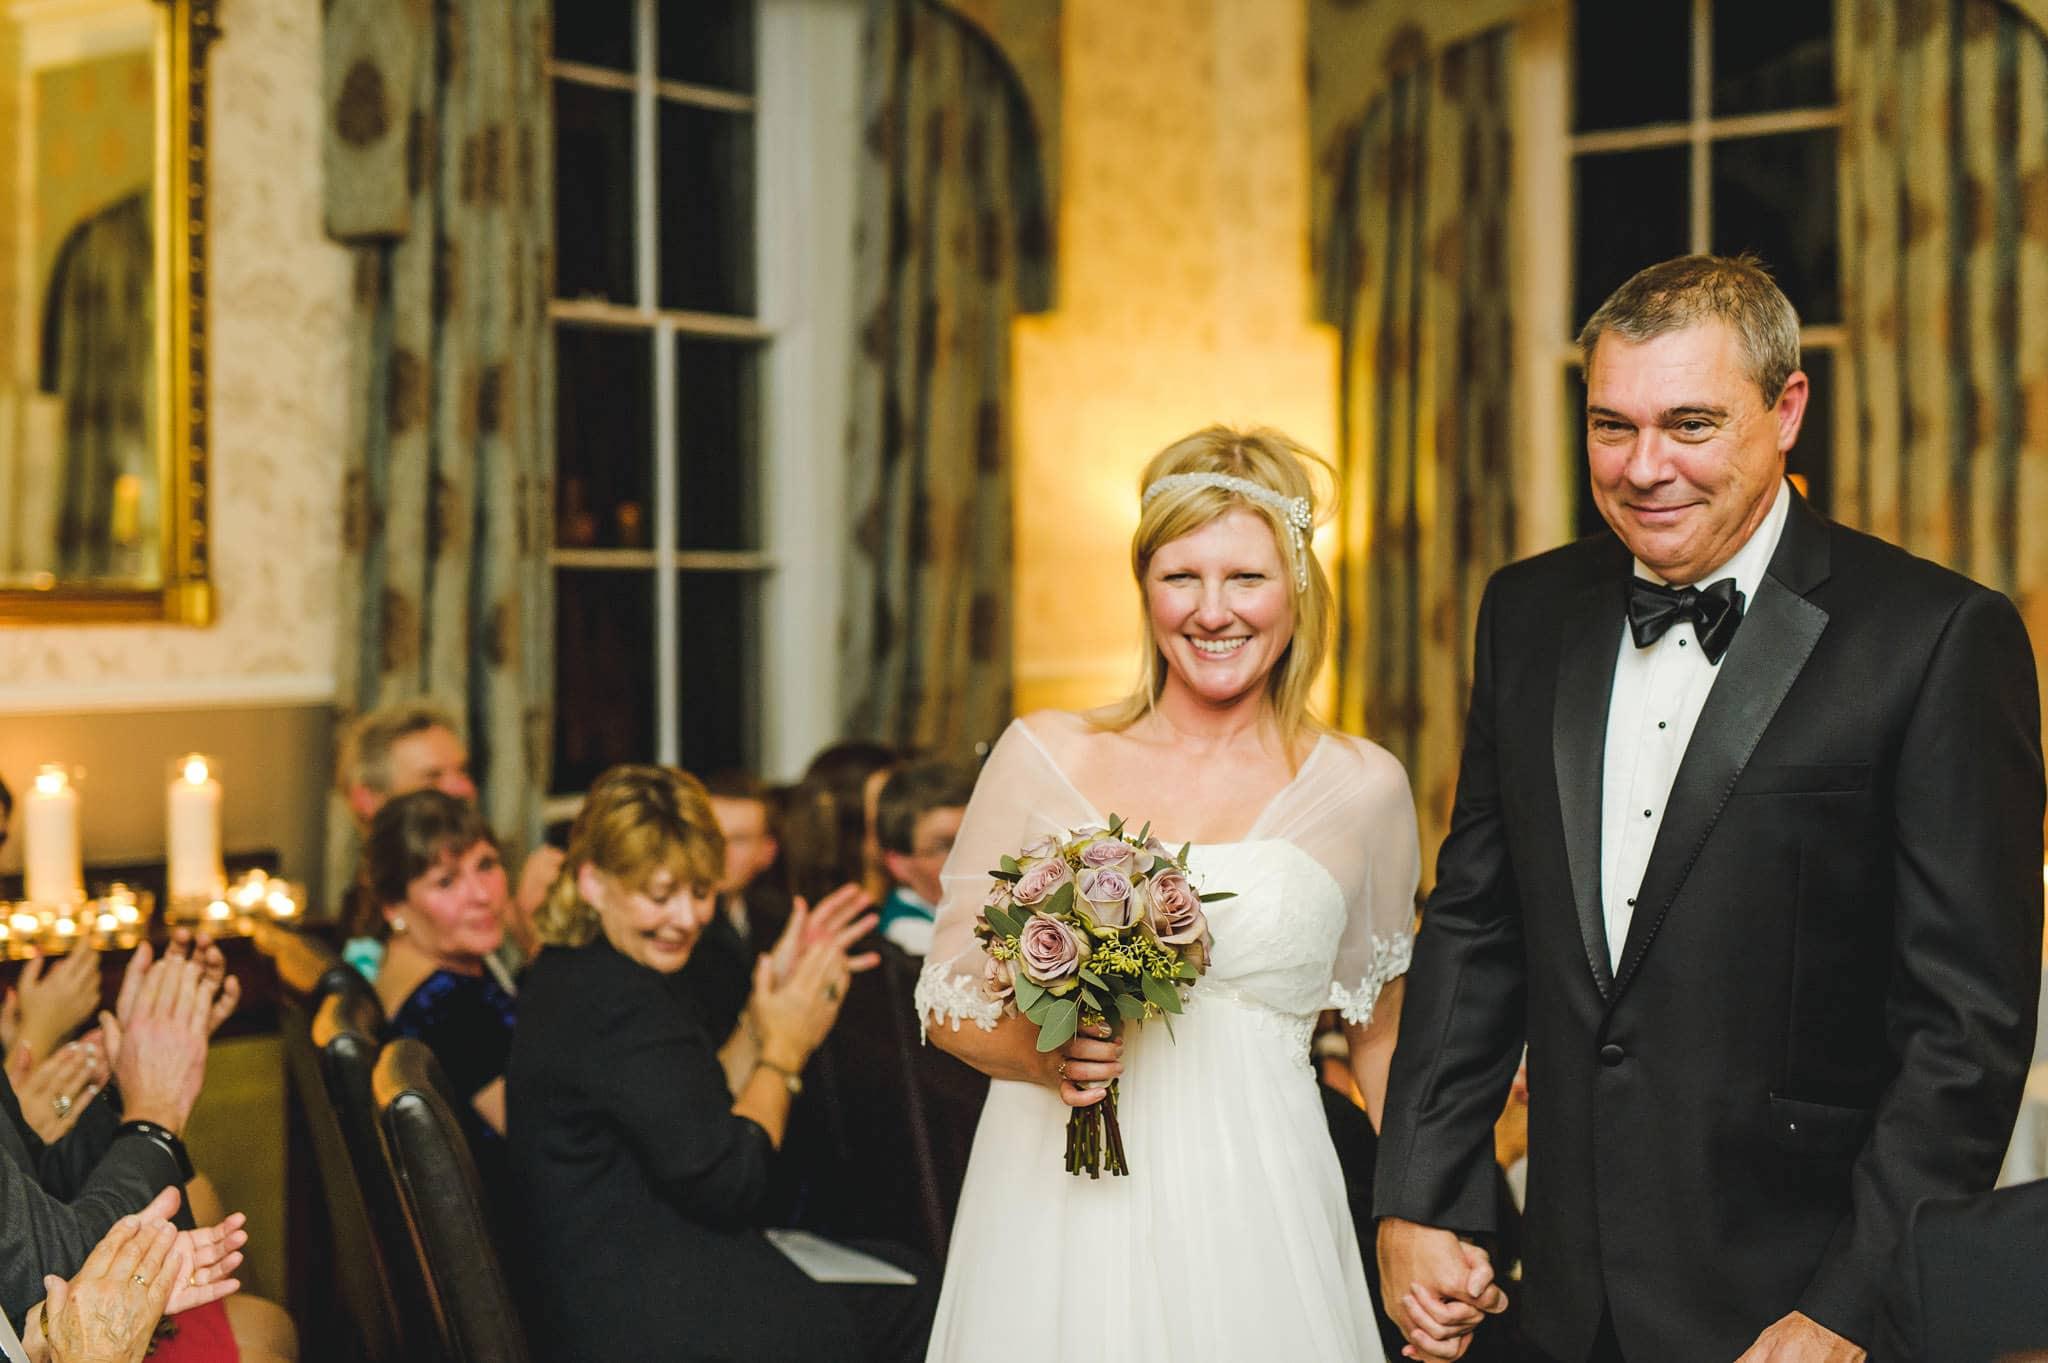 Wedding photography West Midlands | Claire + Stephen 36